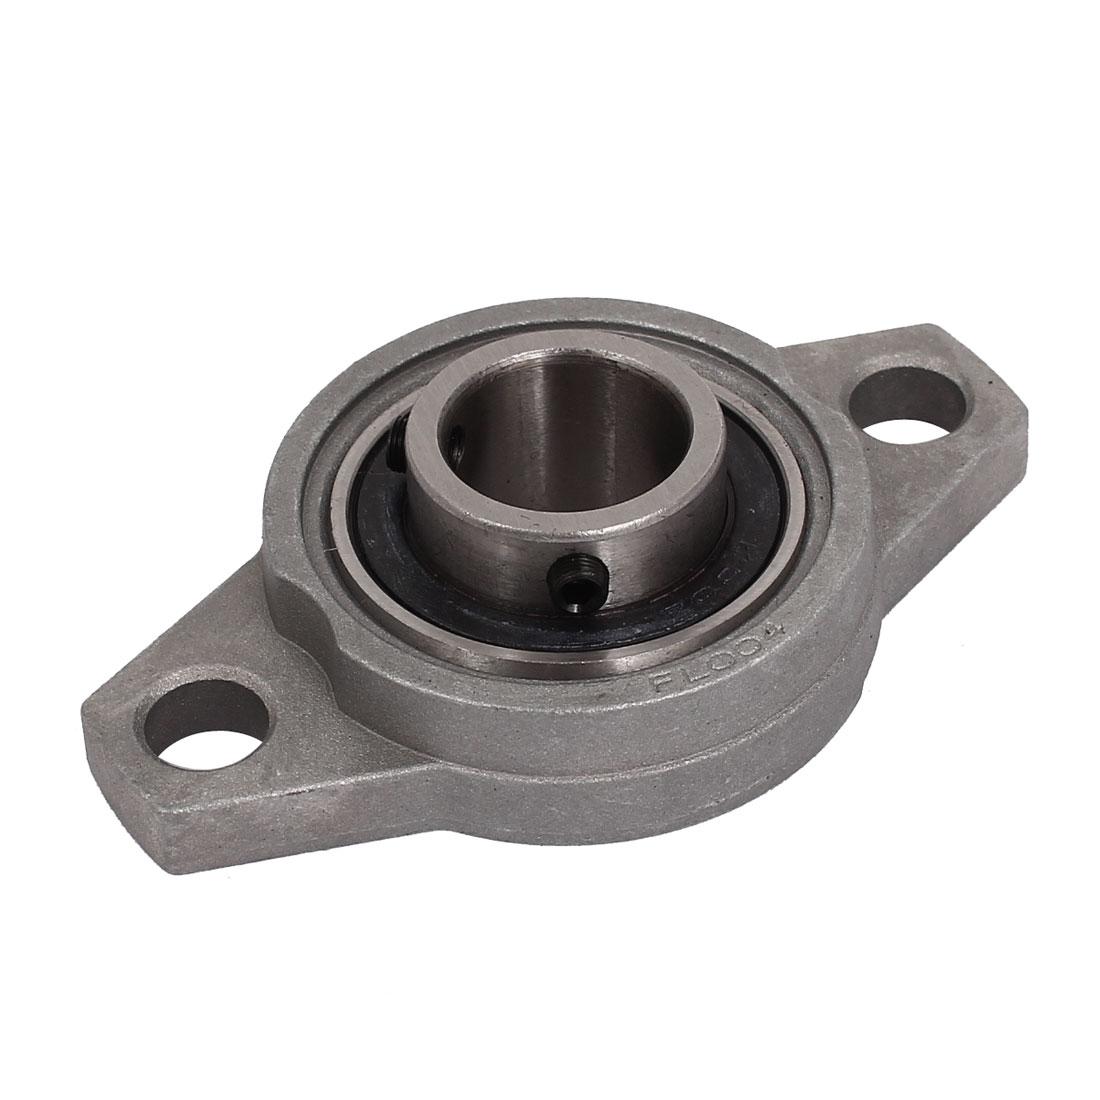 KFL004 20mm Bore Aluminum Alloy Self-aligning Flange Bearing Oval Pillow Block